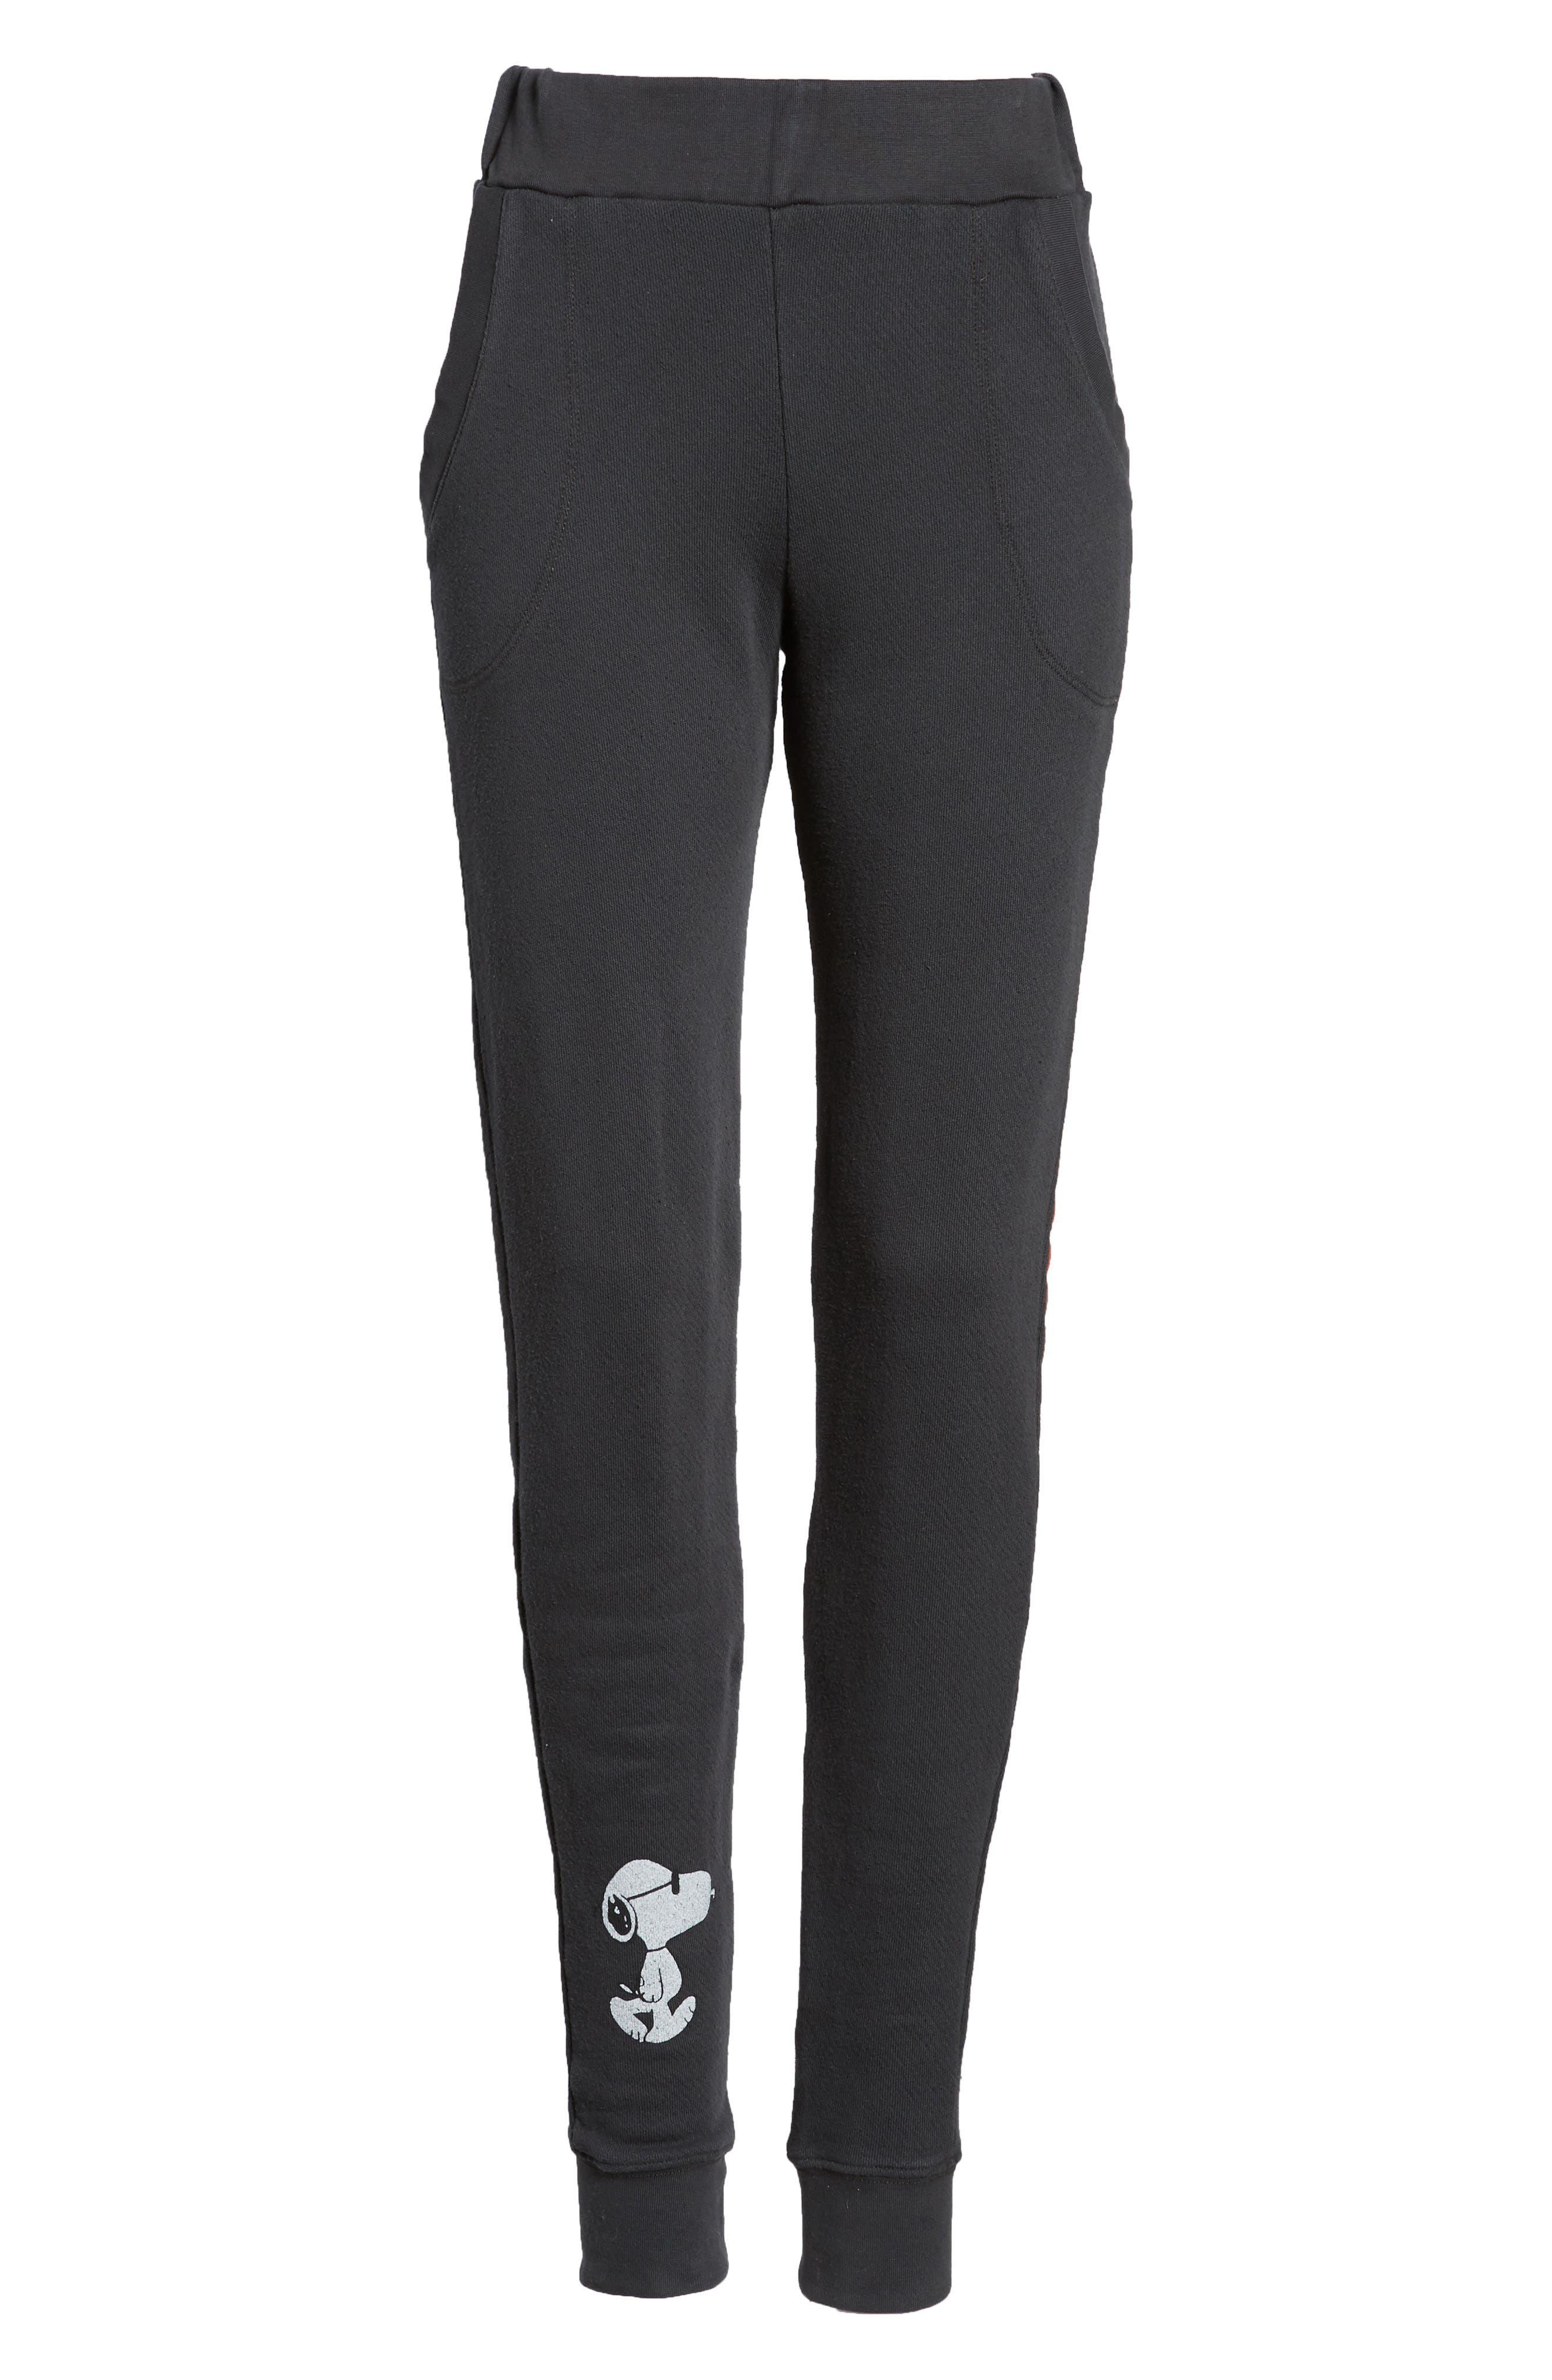 Snoopy Sweatpants,                         Main,                         color, Black